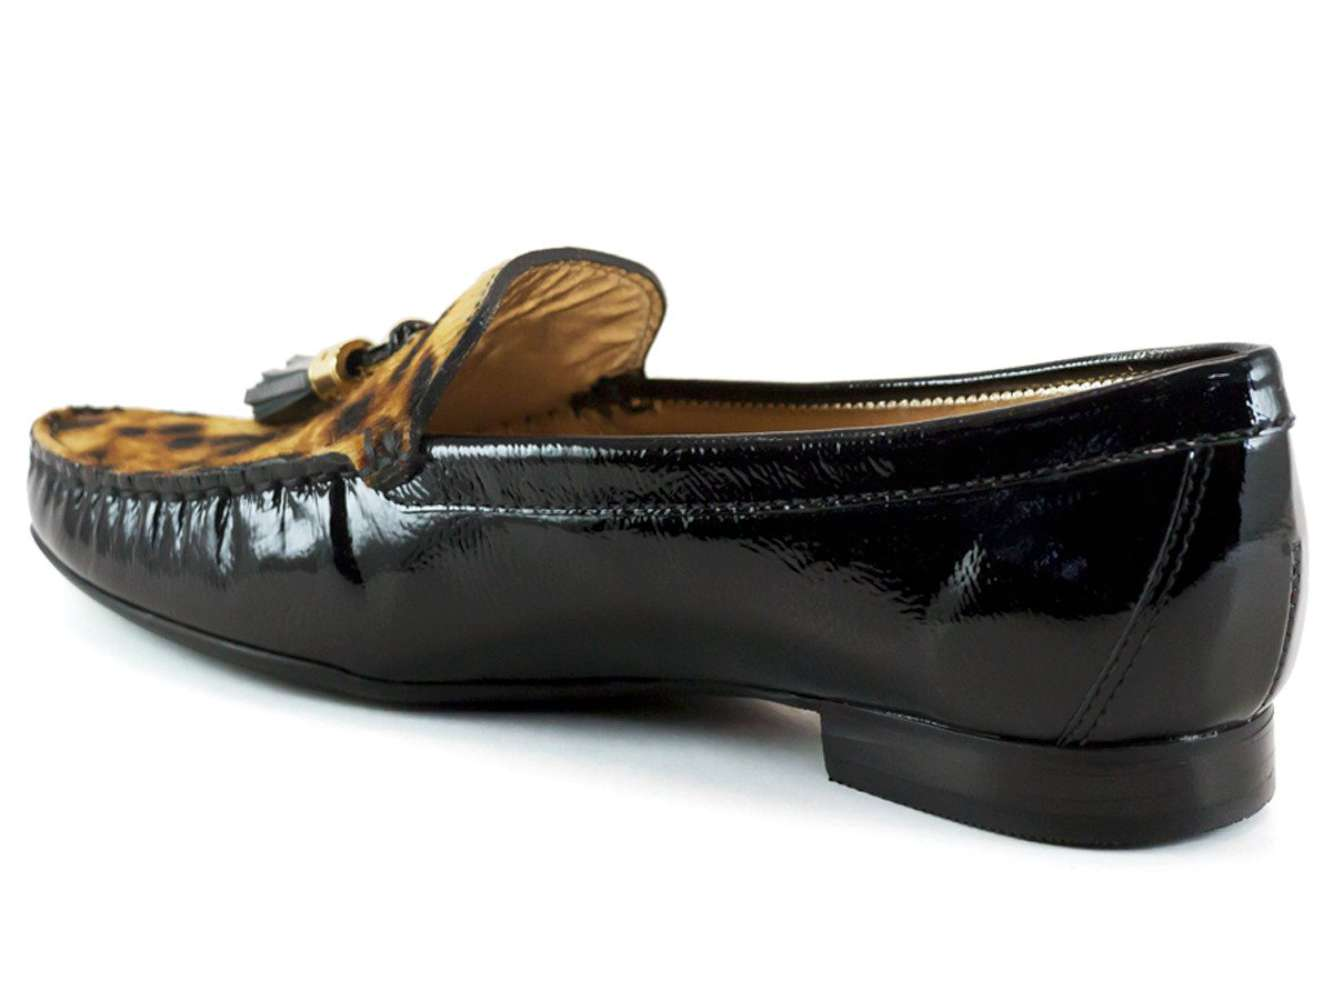 Marc Joseph New York Damenschuhe Toe Wall ST. Leder Closed Toe Damenschuhe Loafers 1e6503